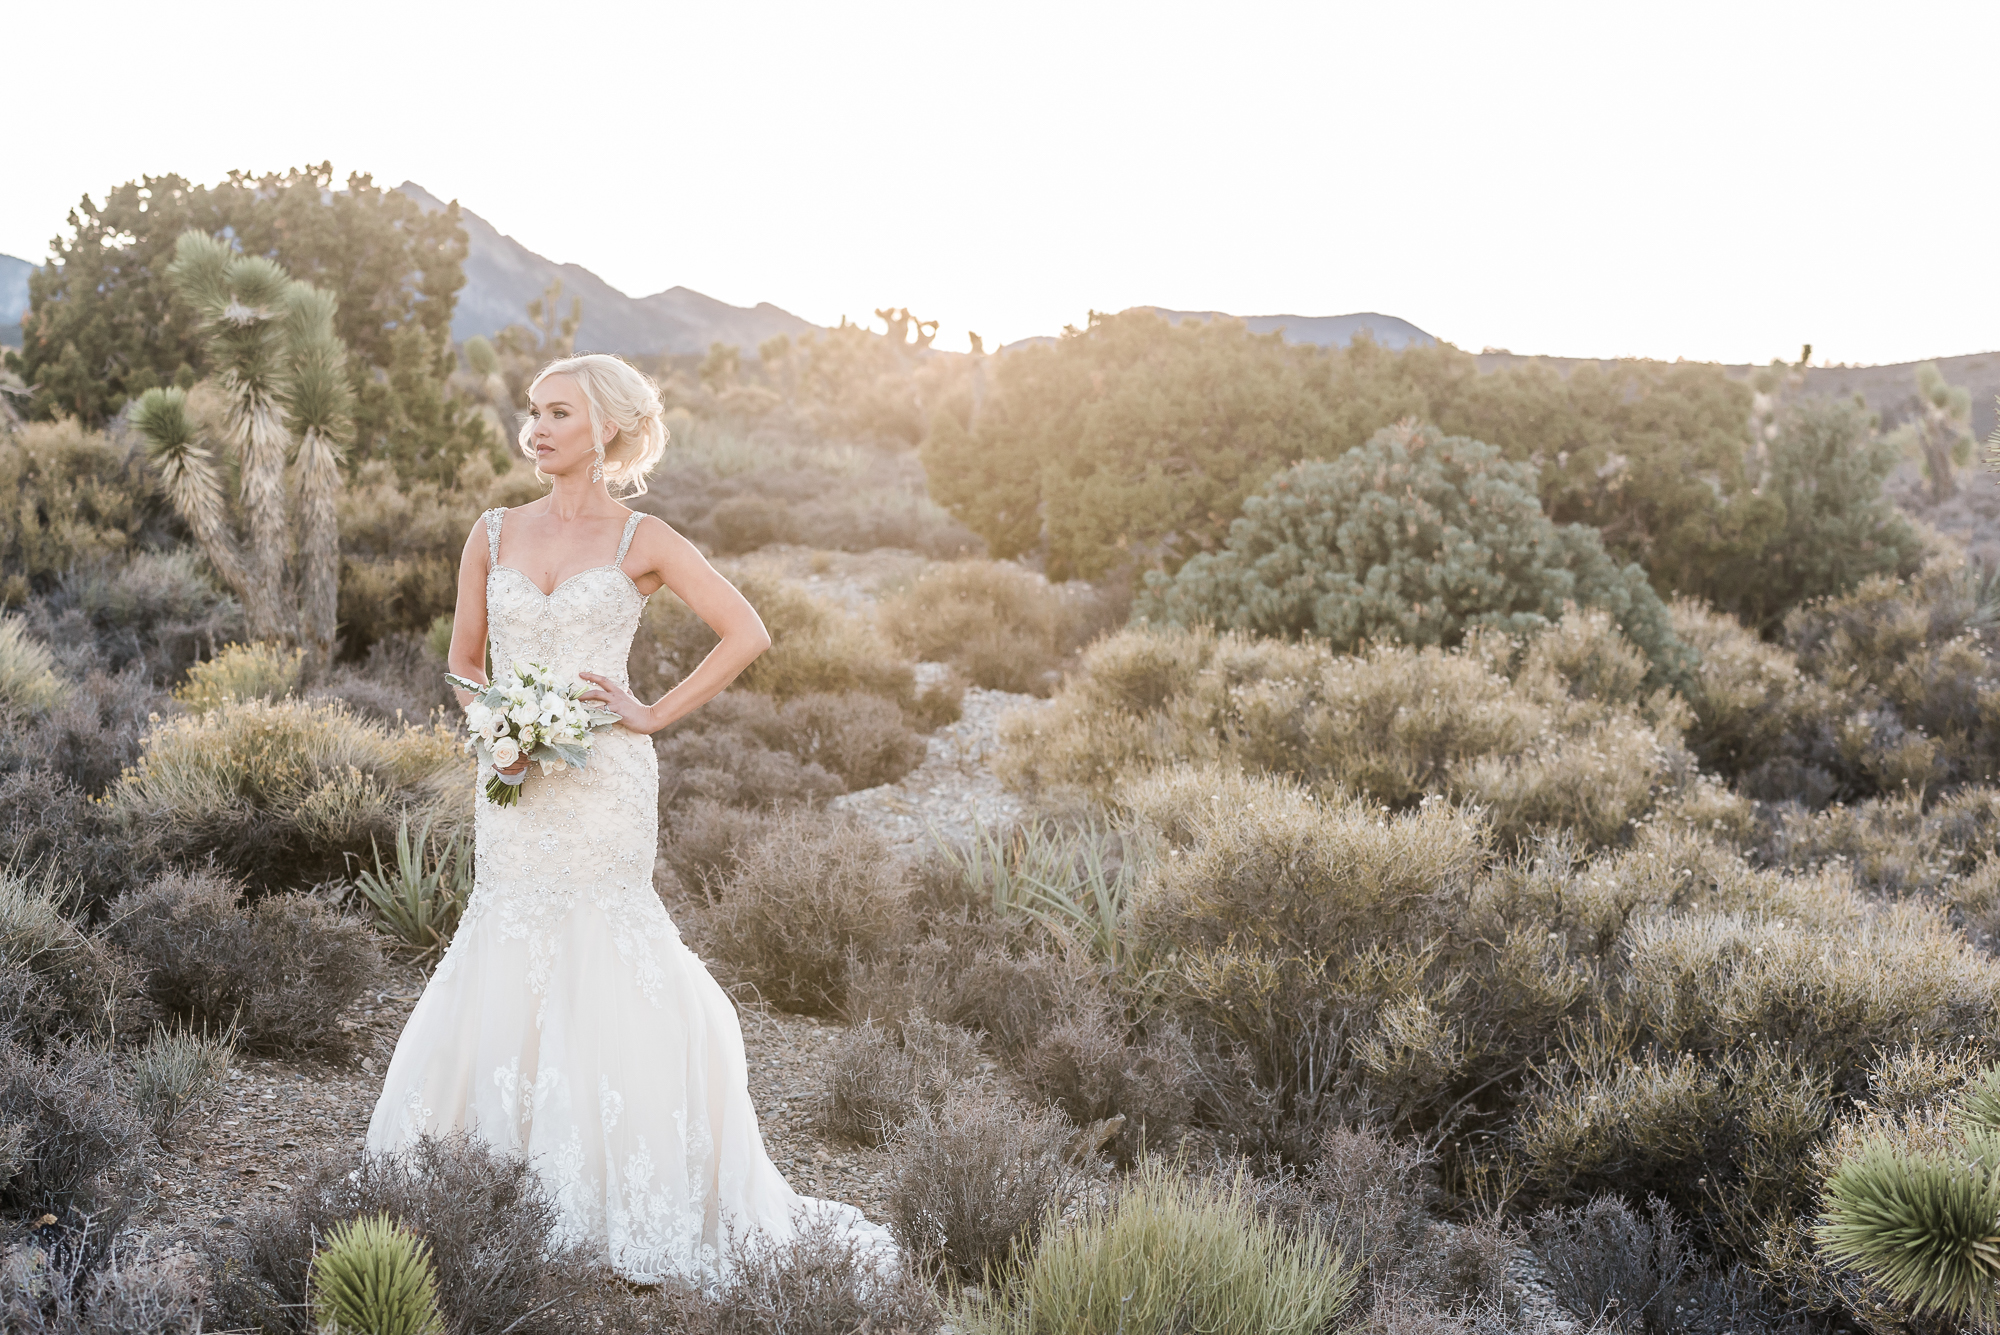 Kristen Marie Weddings + Portraits | Mt. Charleston Wedding